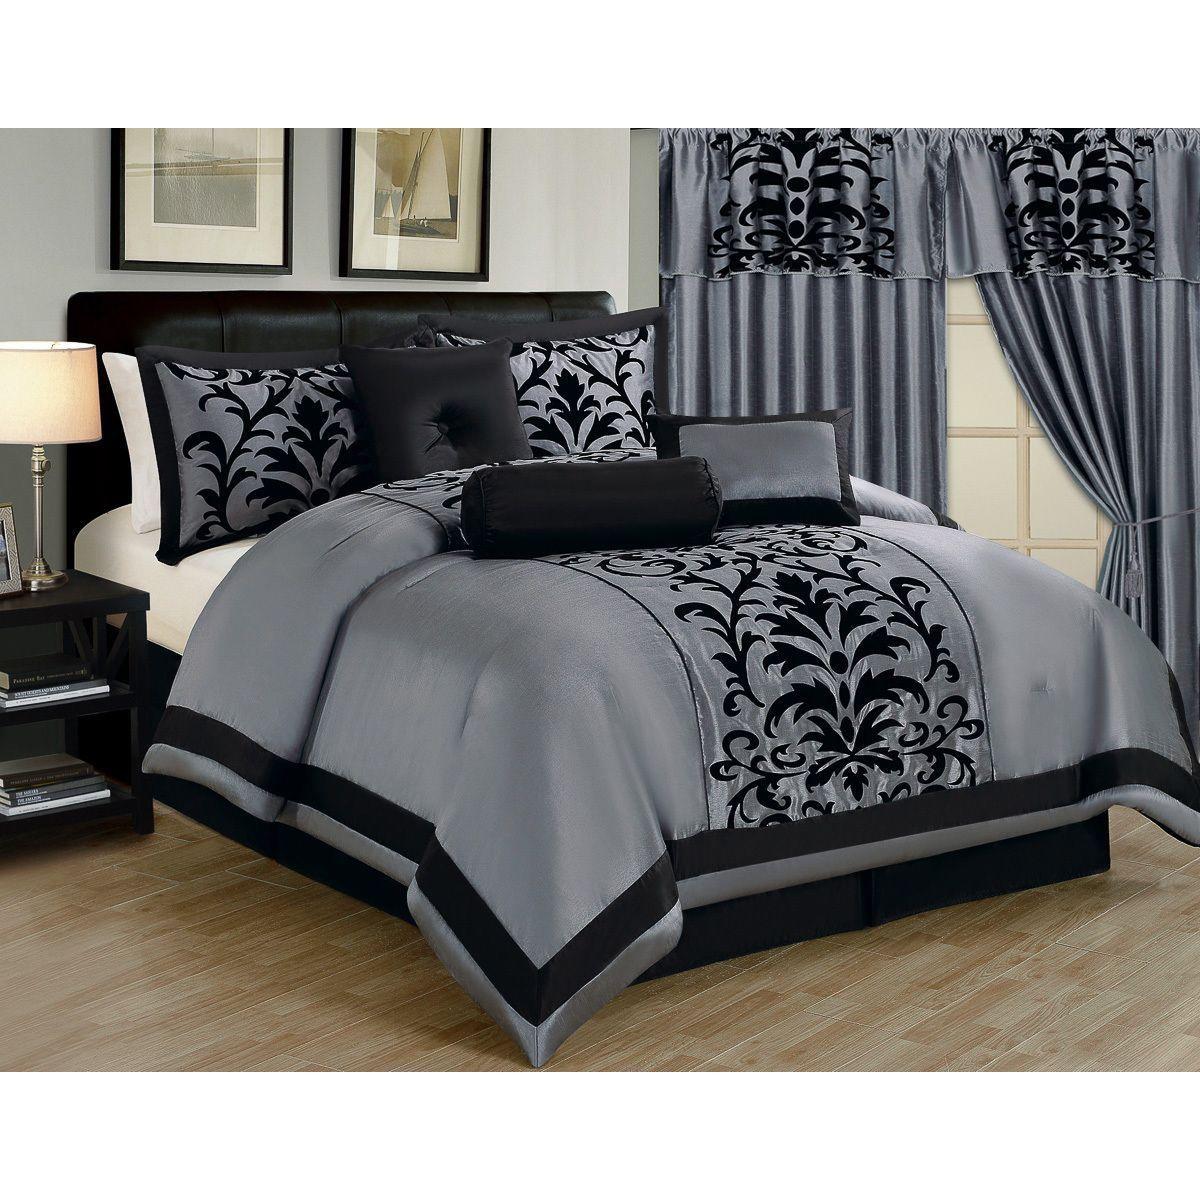 This Elegant Damask Comforter Set Is Crafted Of High Quality 100 Percent Polyester For Comfort Luxury Bedding Master Bedroom Comforter Sets Bed Comforter Sets